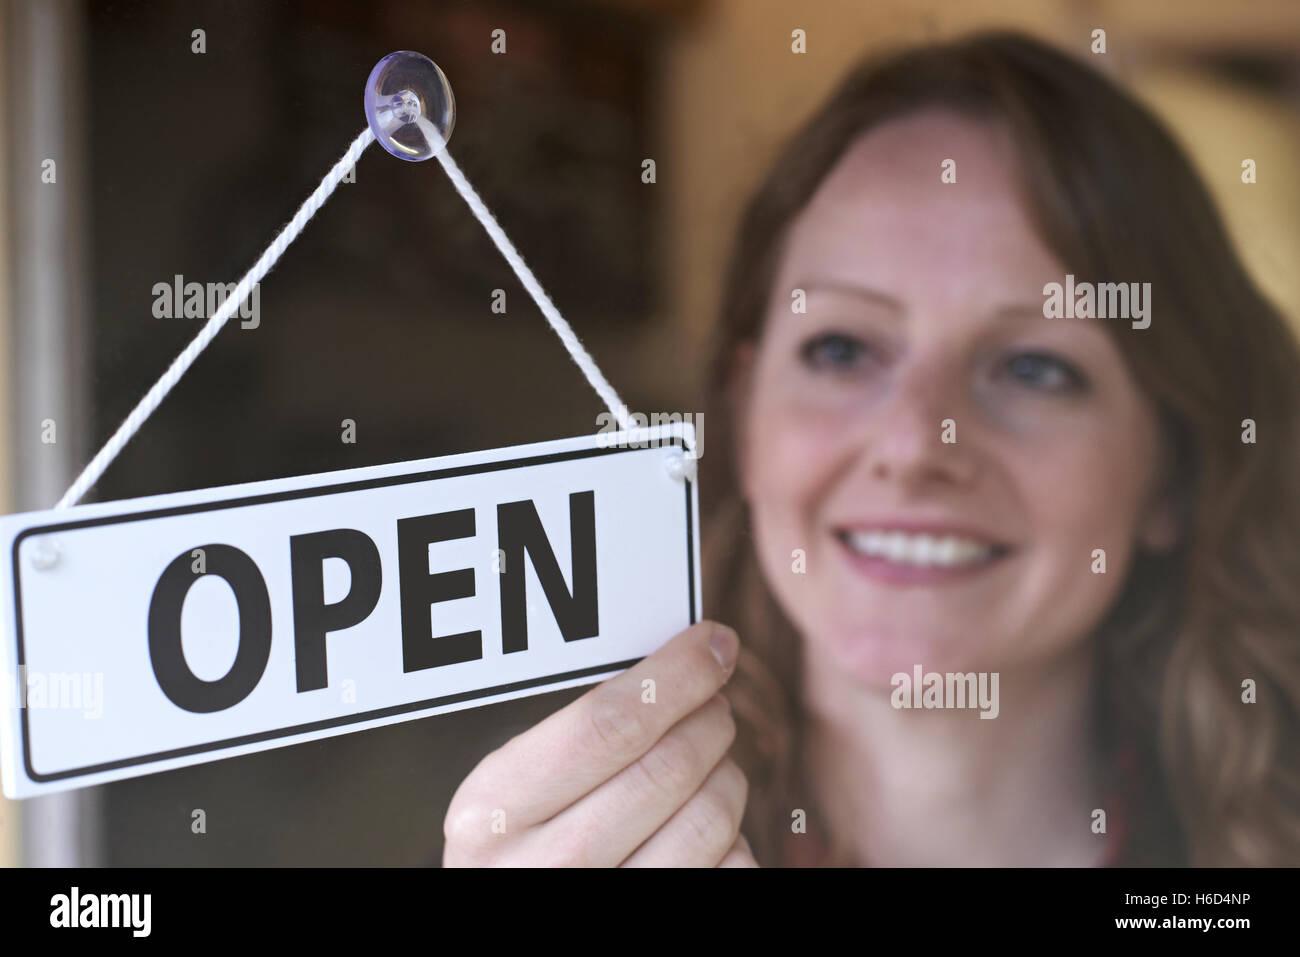 Store Owner Turning Open Sign In Shop Doorway Stock Photo